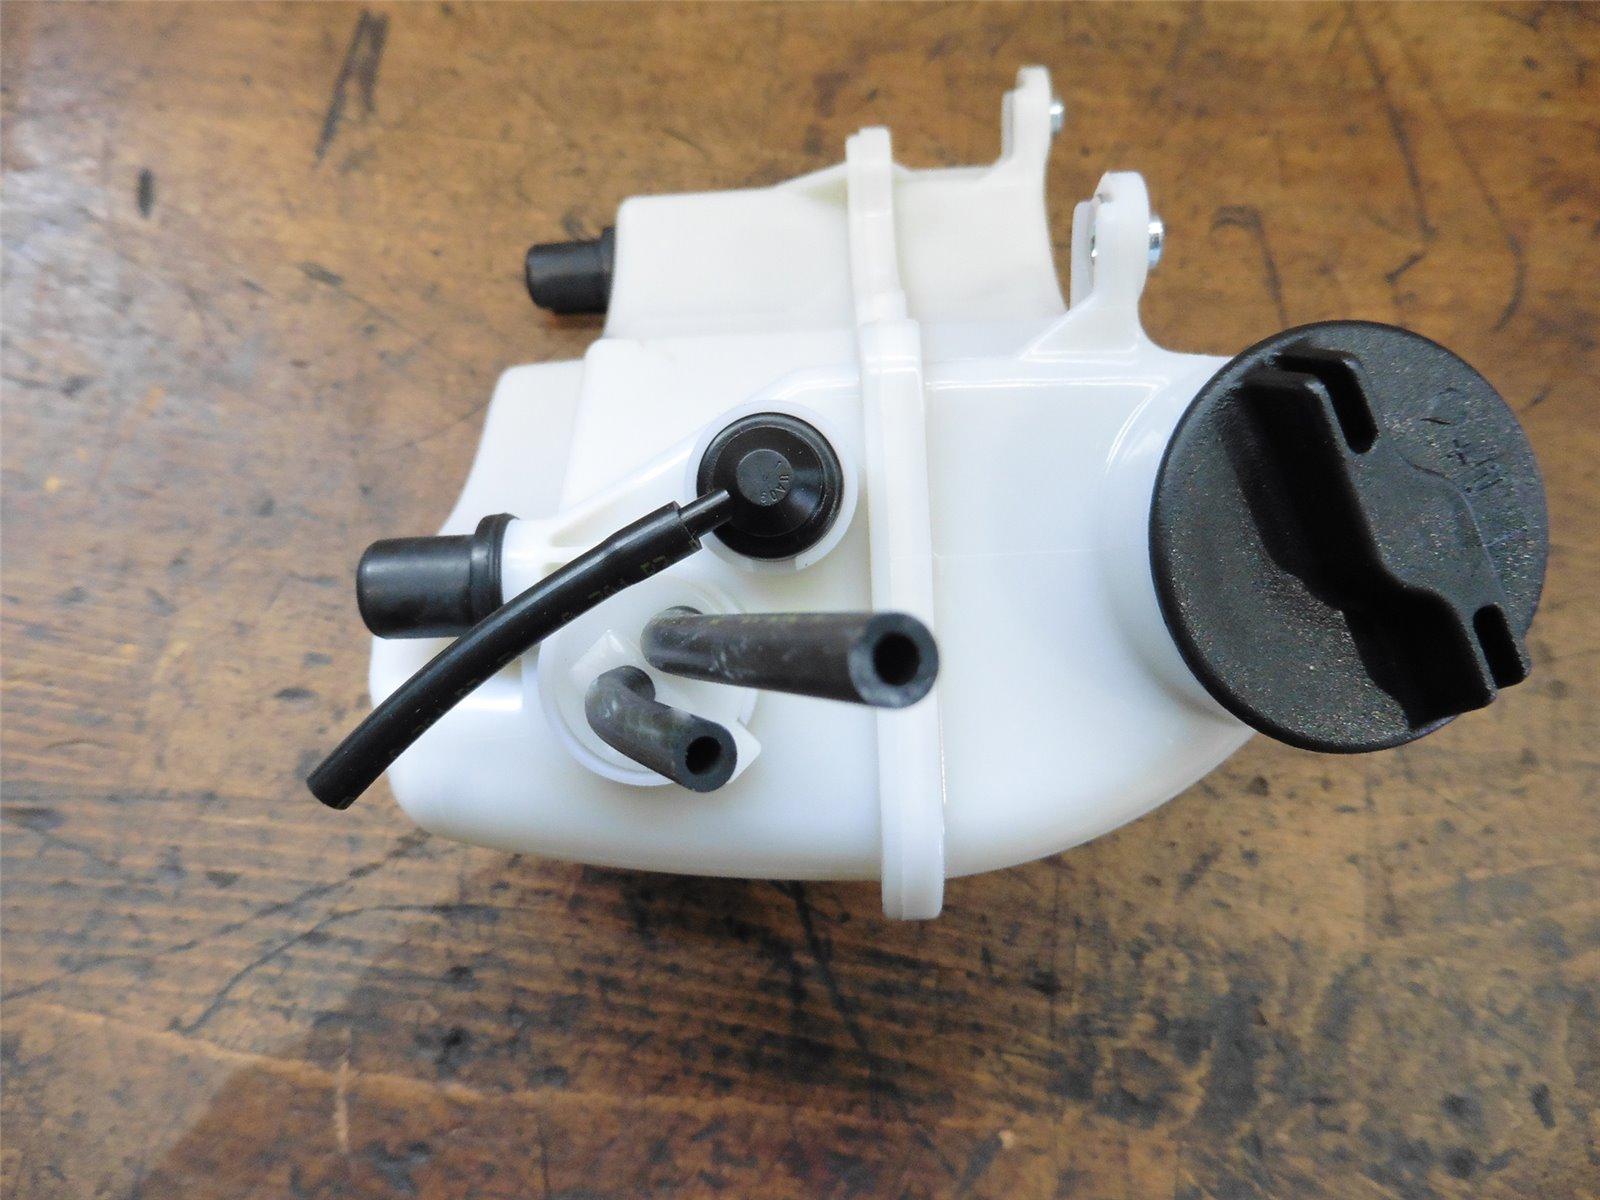 Luftfilter passend zu Stihl Motorsense FS 87 FS 90 KM 90 FS 90 R